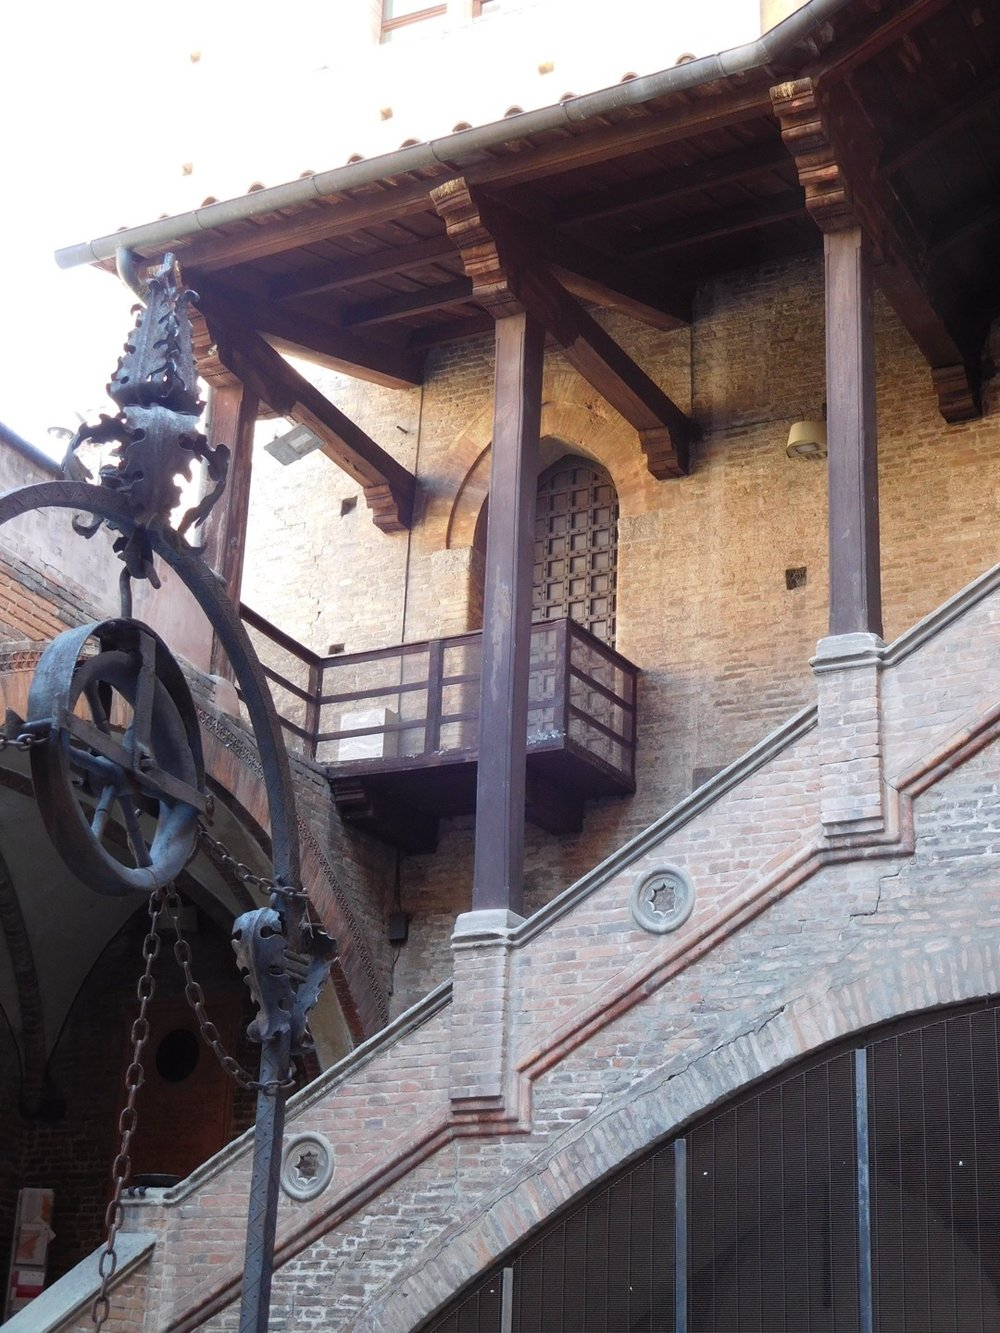 Courtyard, Palazzo Re Enzo, Bologna.